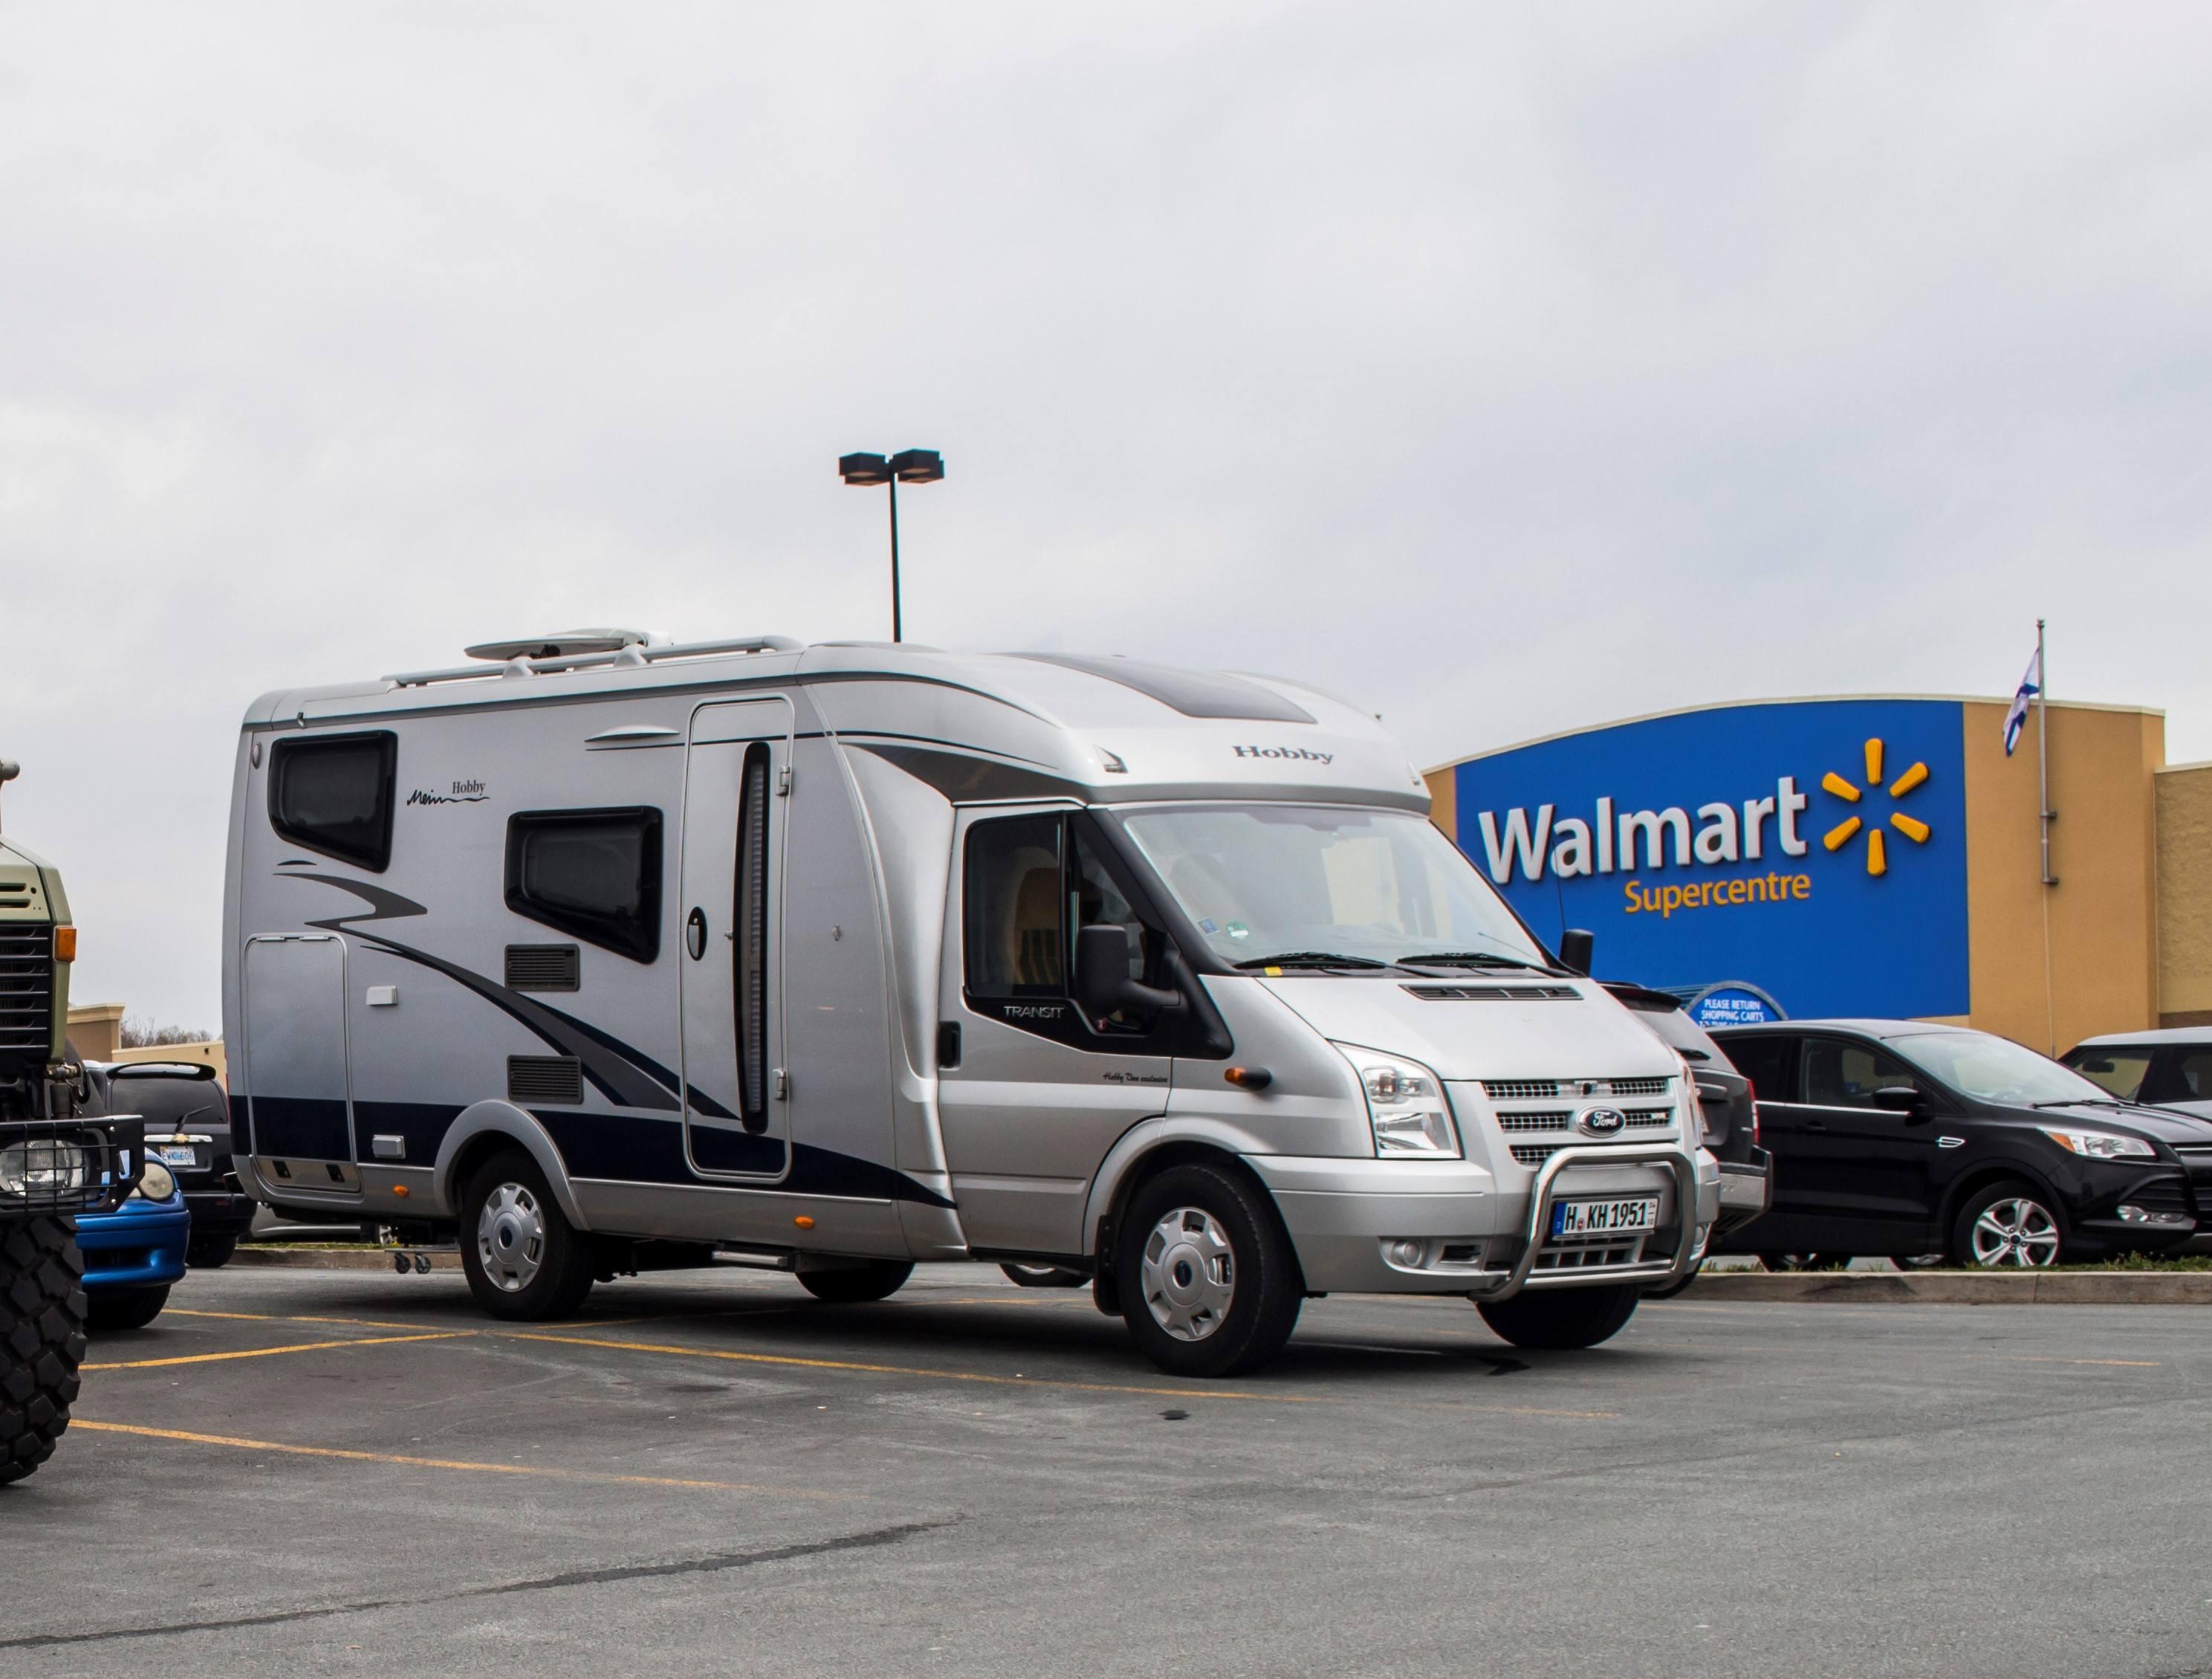 RV recreational vehicles at Walmart